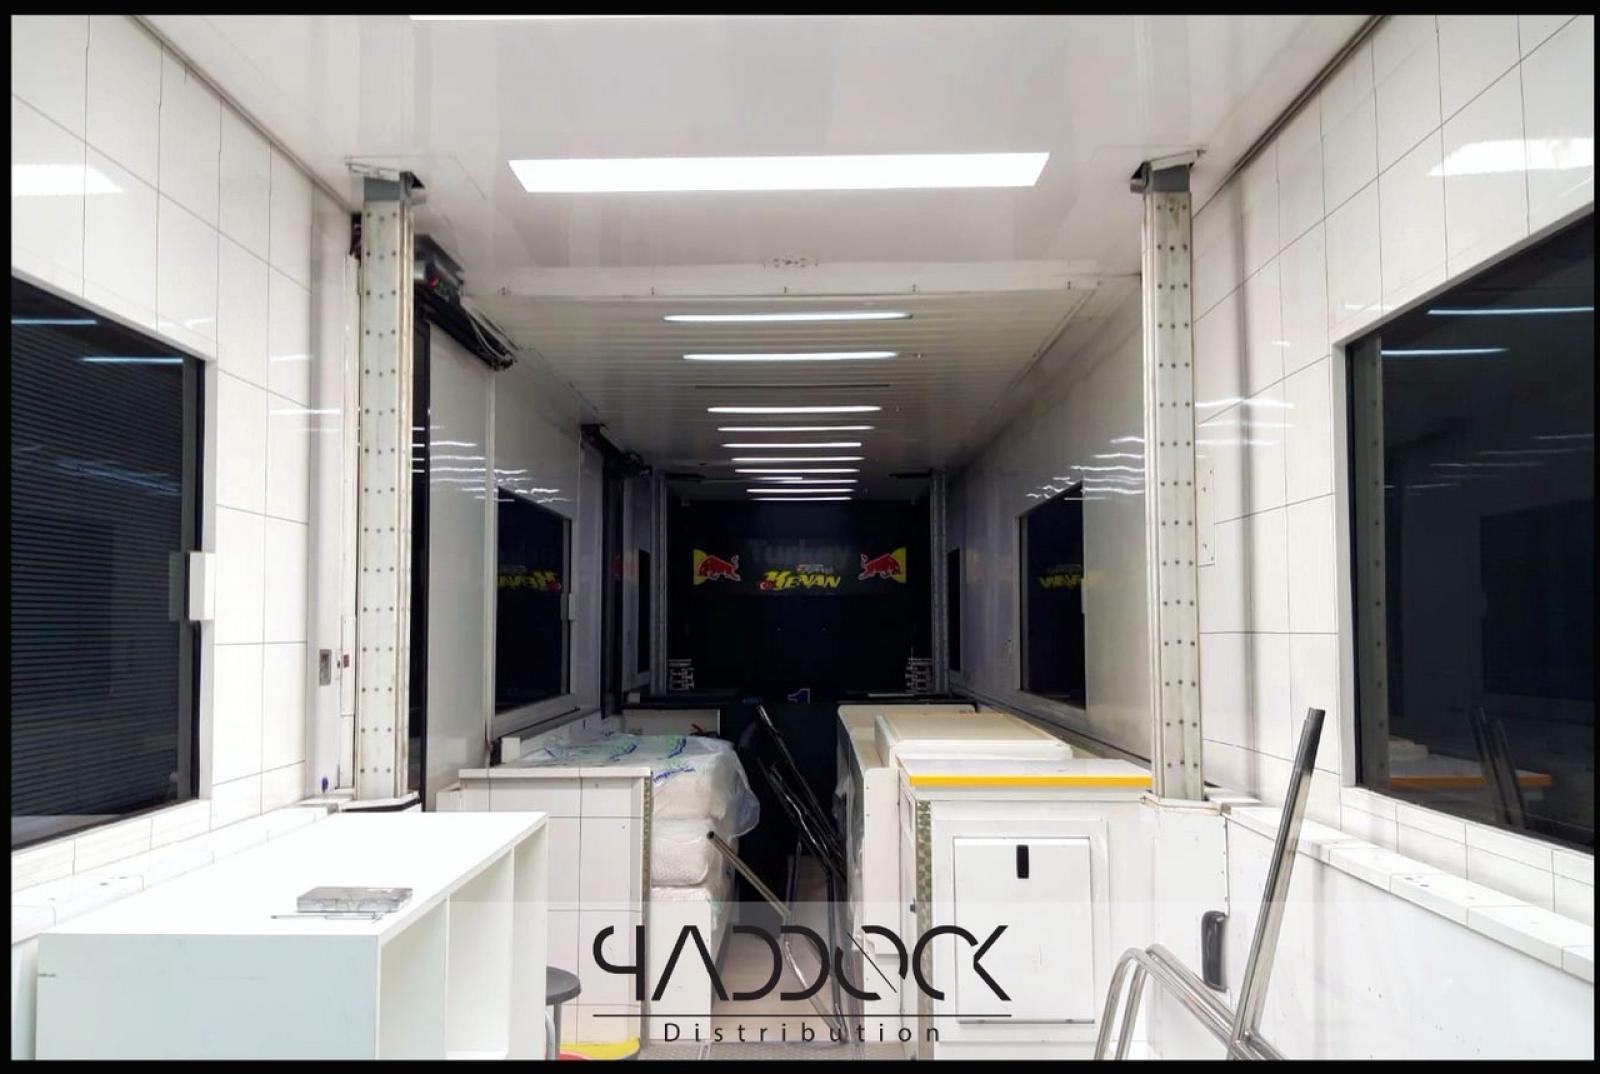 Used trailer WHEELBASE ENGINEERING by Paddock Distribution - 4